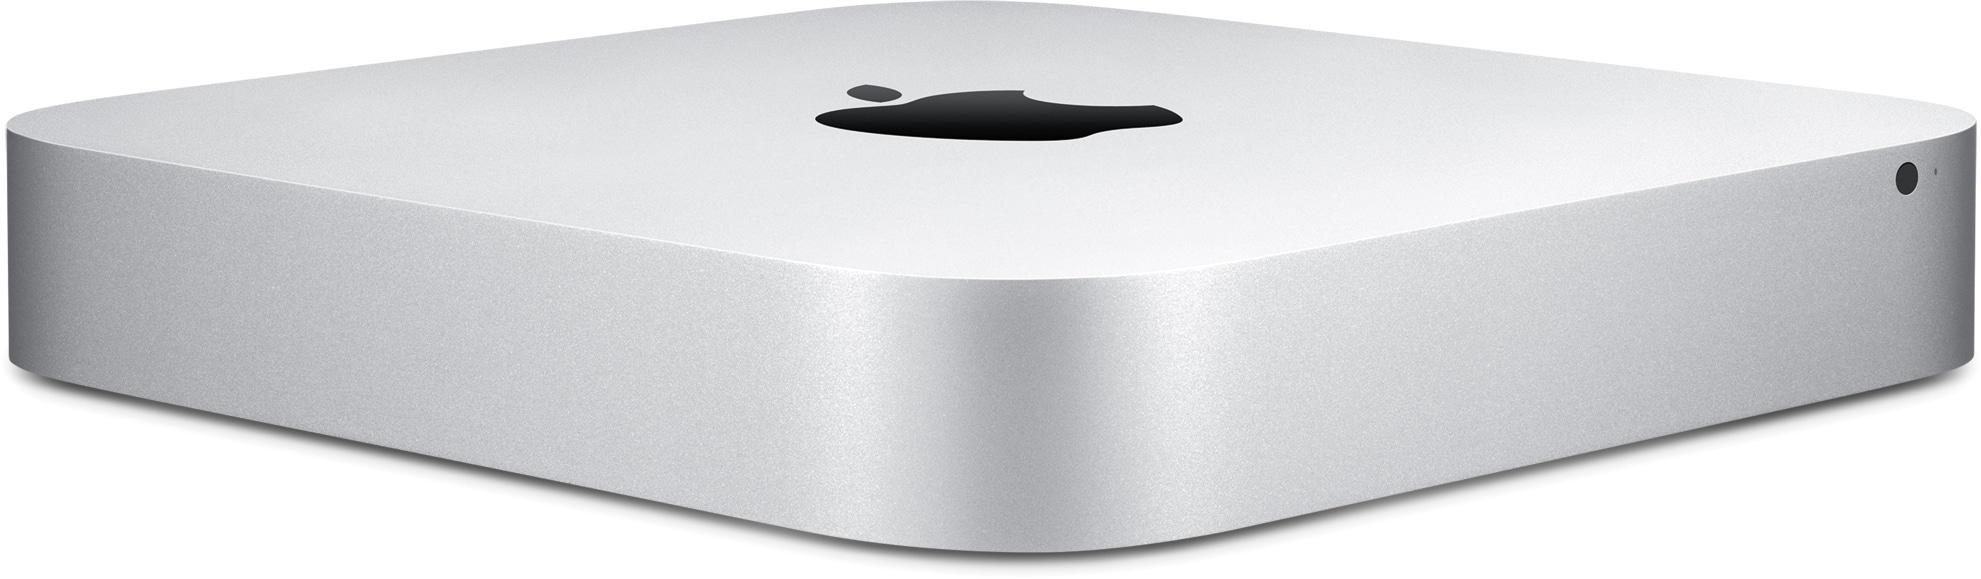 Novo Mac mini de frente e de lado